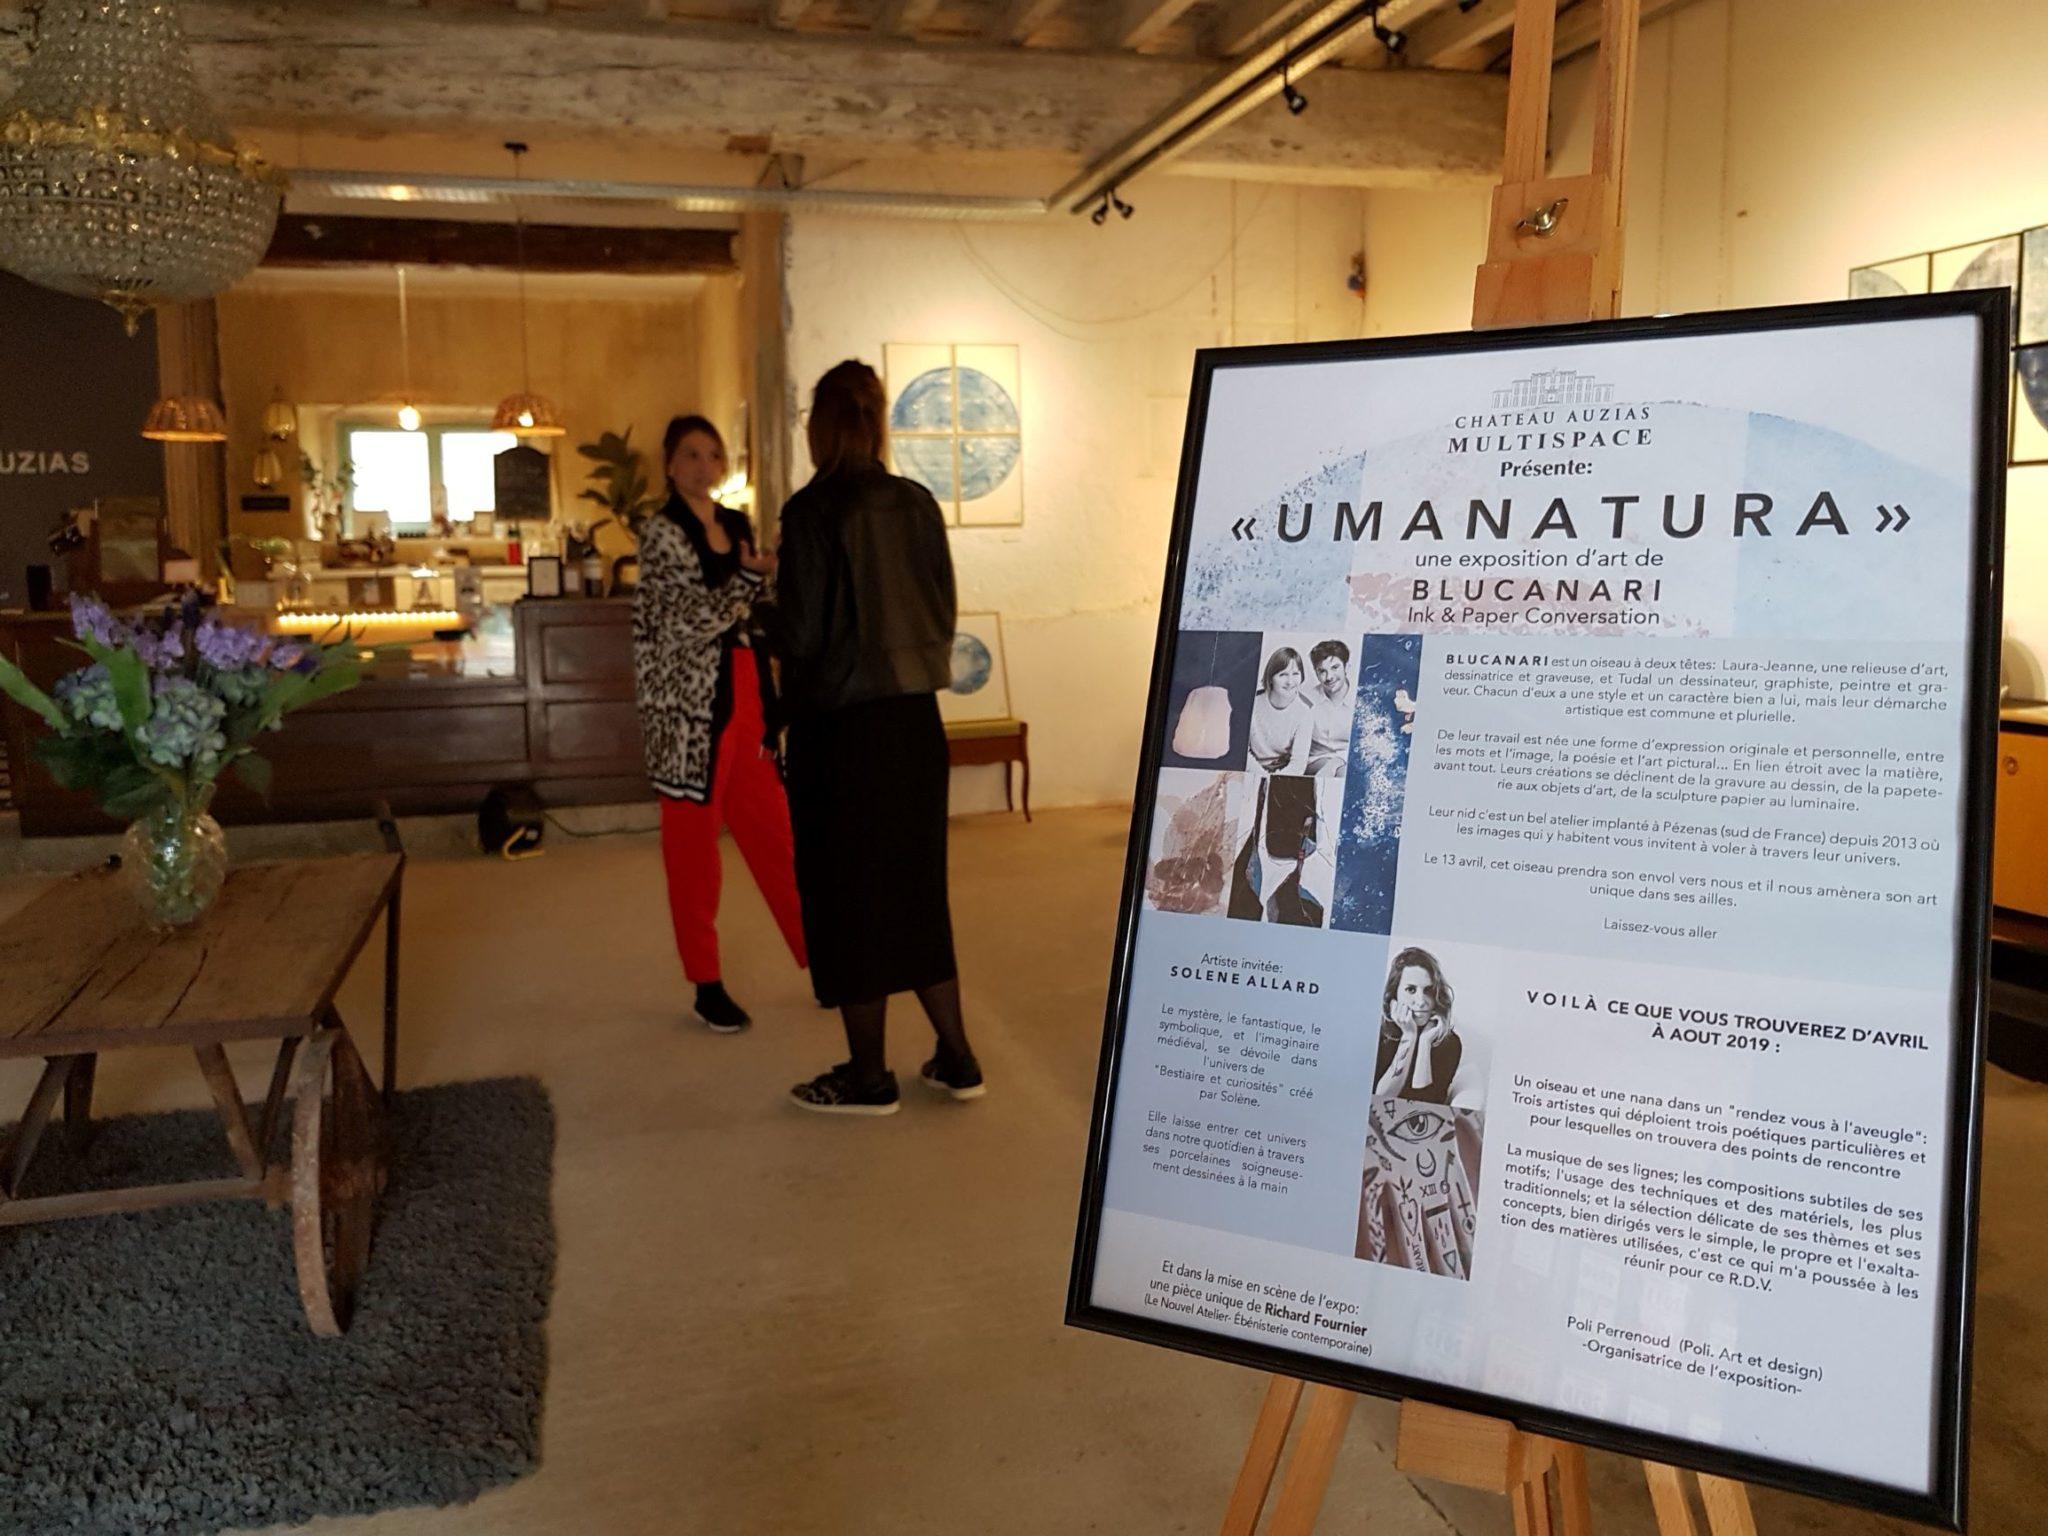 EXPOSITION UMANATURA